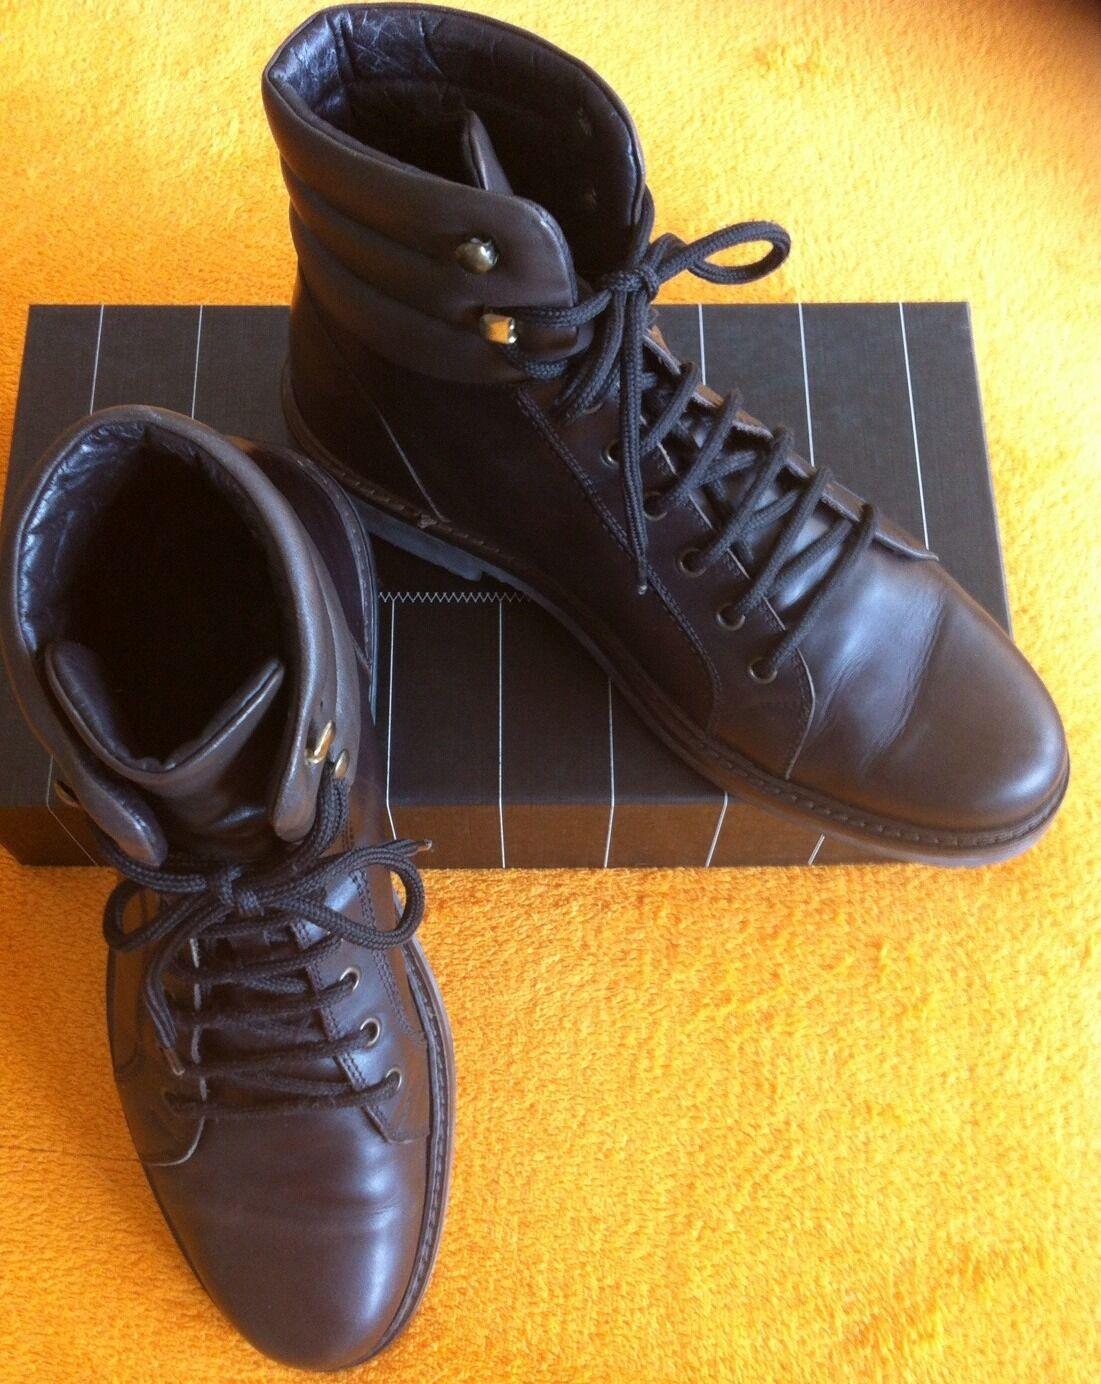 Z Zegna Zegna Z ***Schuhe~Ankle Boots***Gr.8 /42***braunes Glattleder***Neu** aeb81e